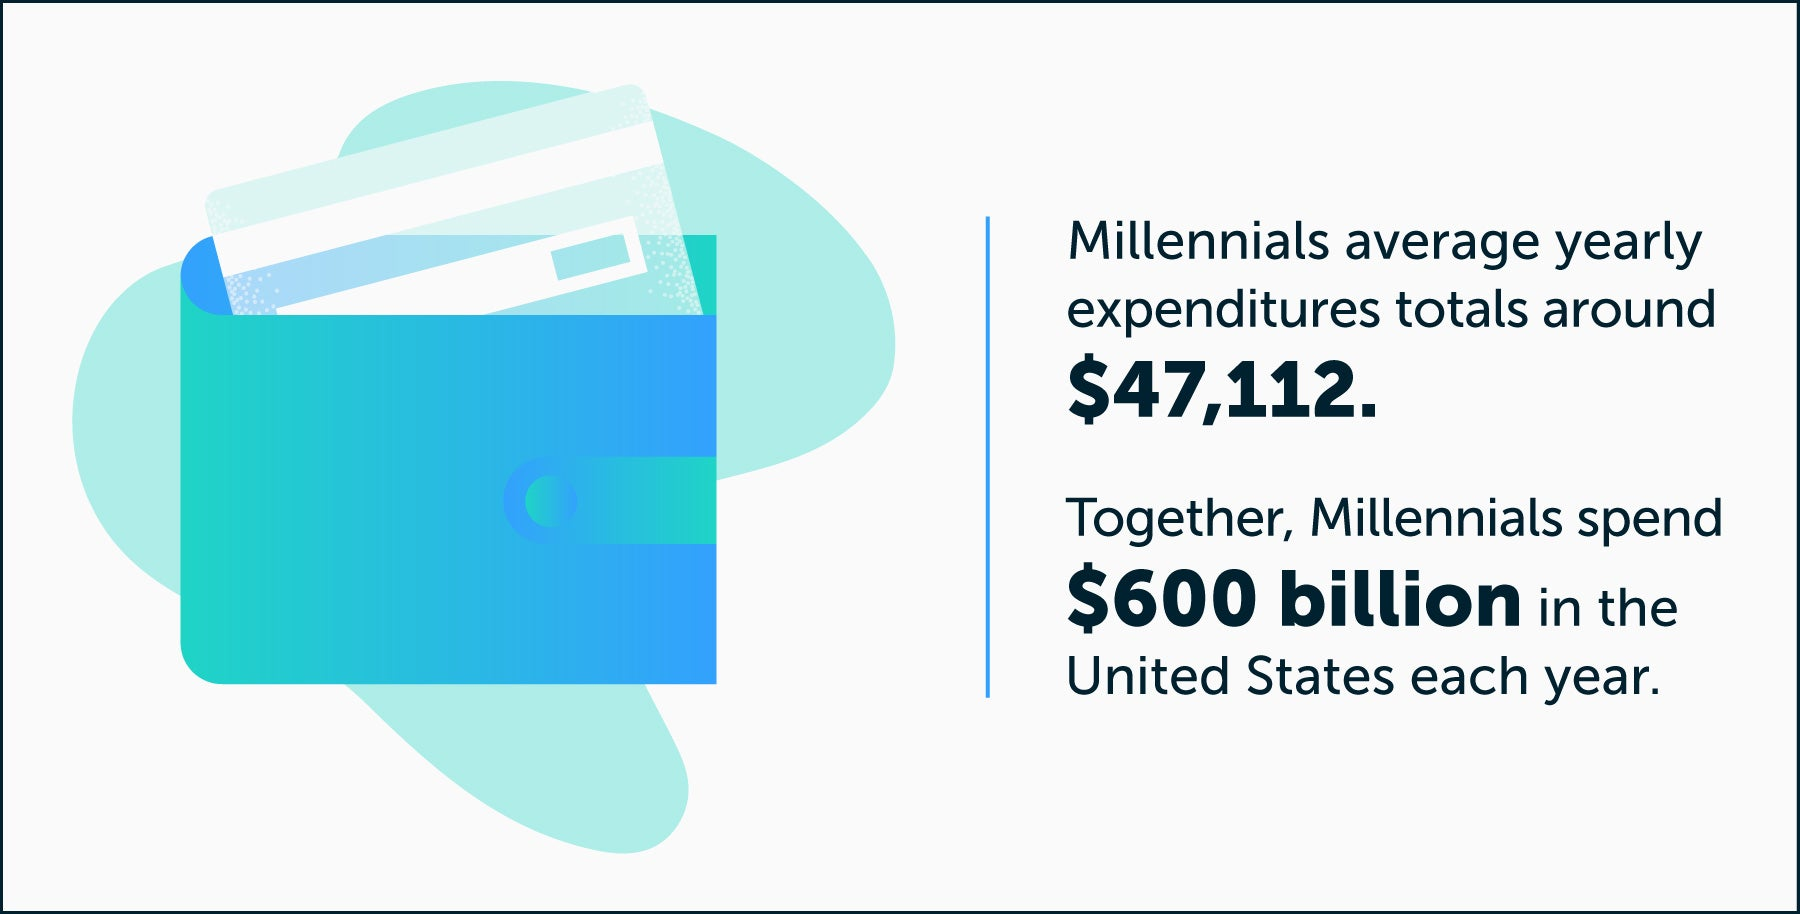 millennial expenditures